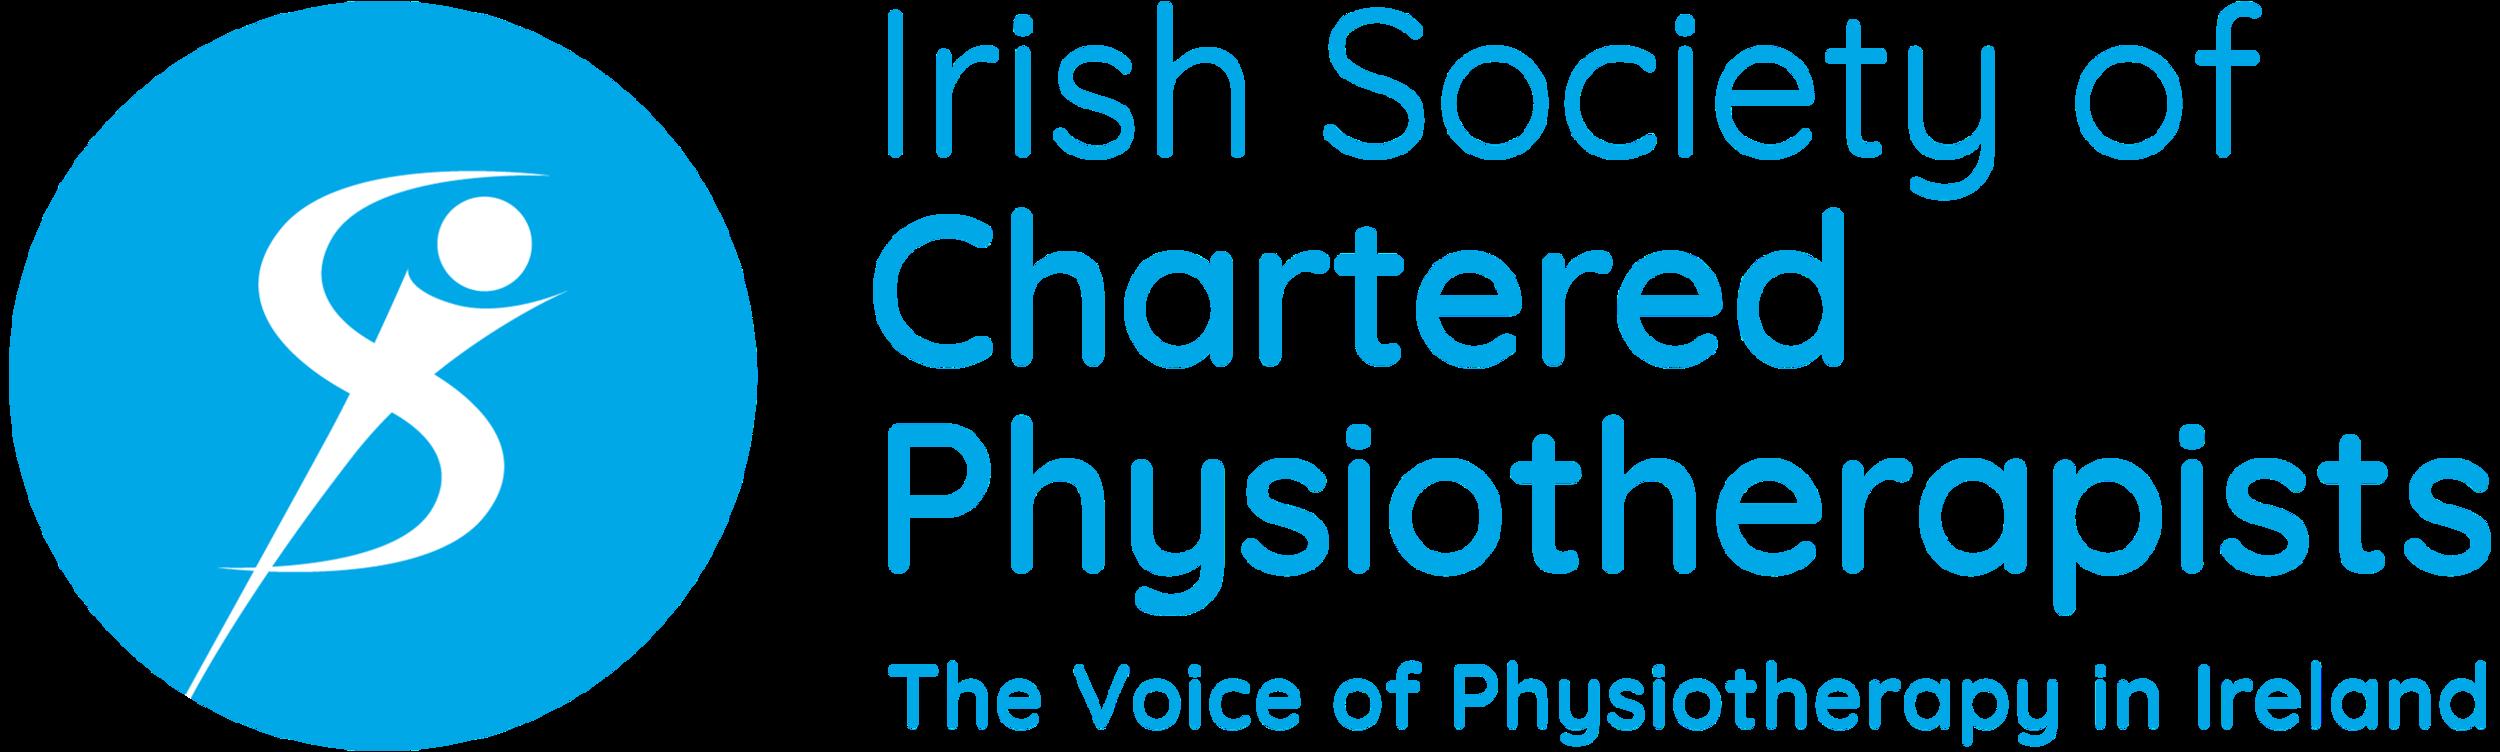 ISCP Primary Logo v 3 14Feb19.jpg.png